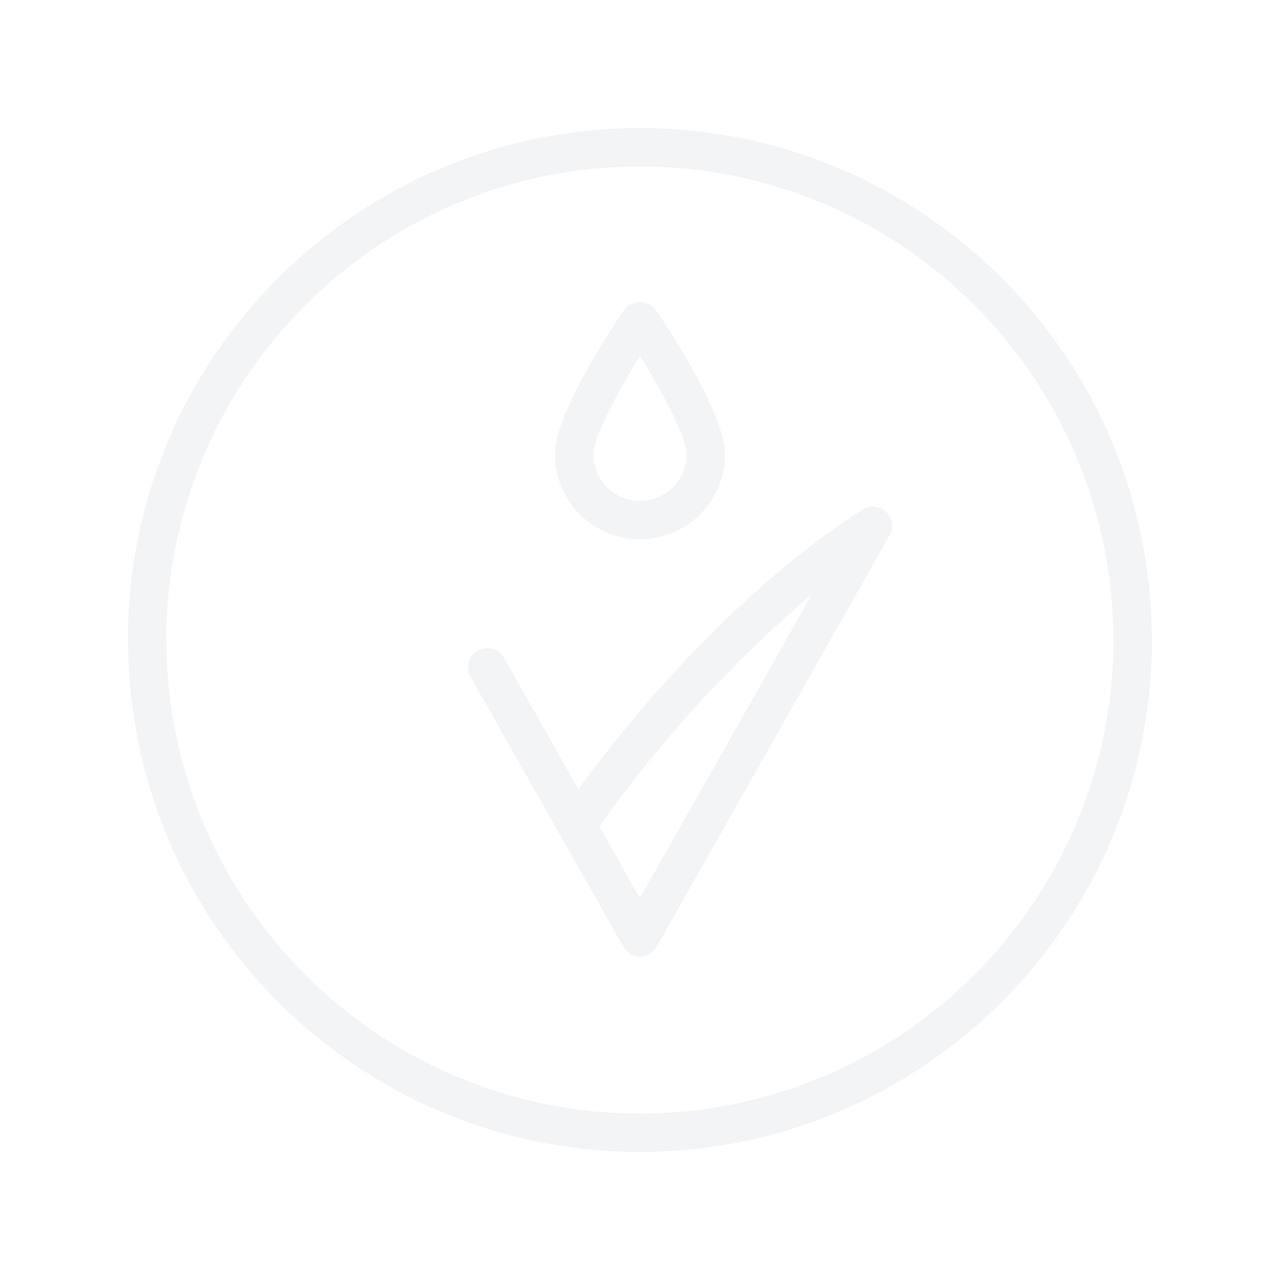 WELLA PROFESSIONALS EIMI Mistify Me Light Hairspray 500ml